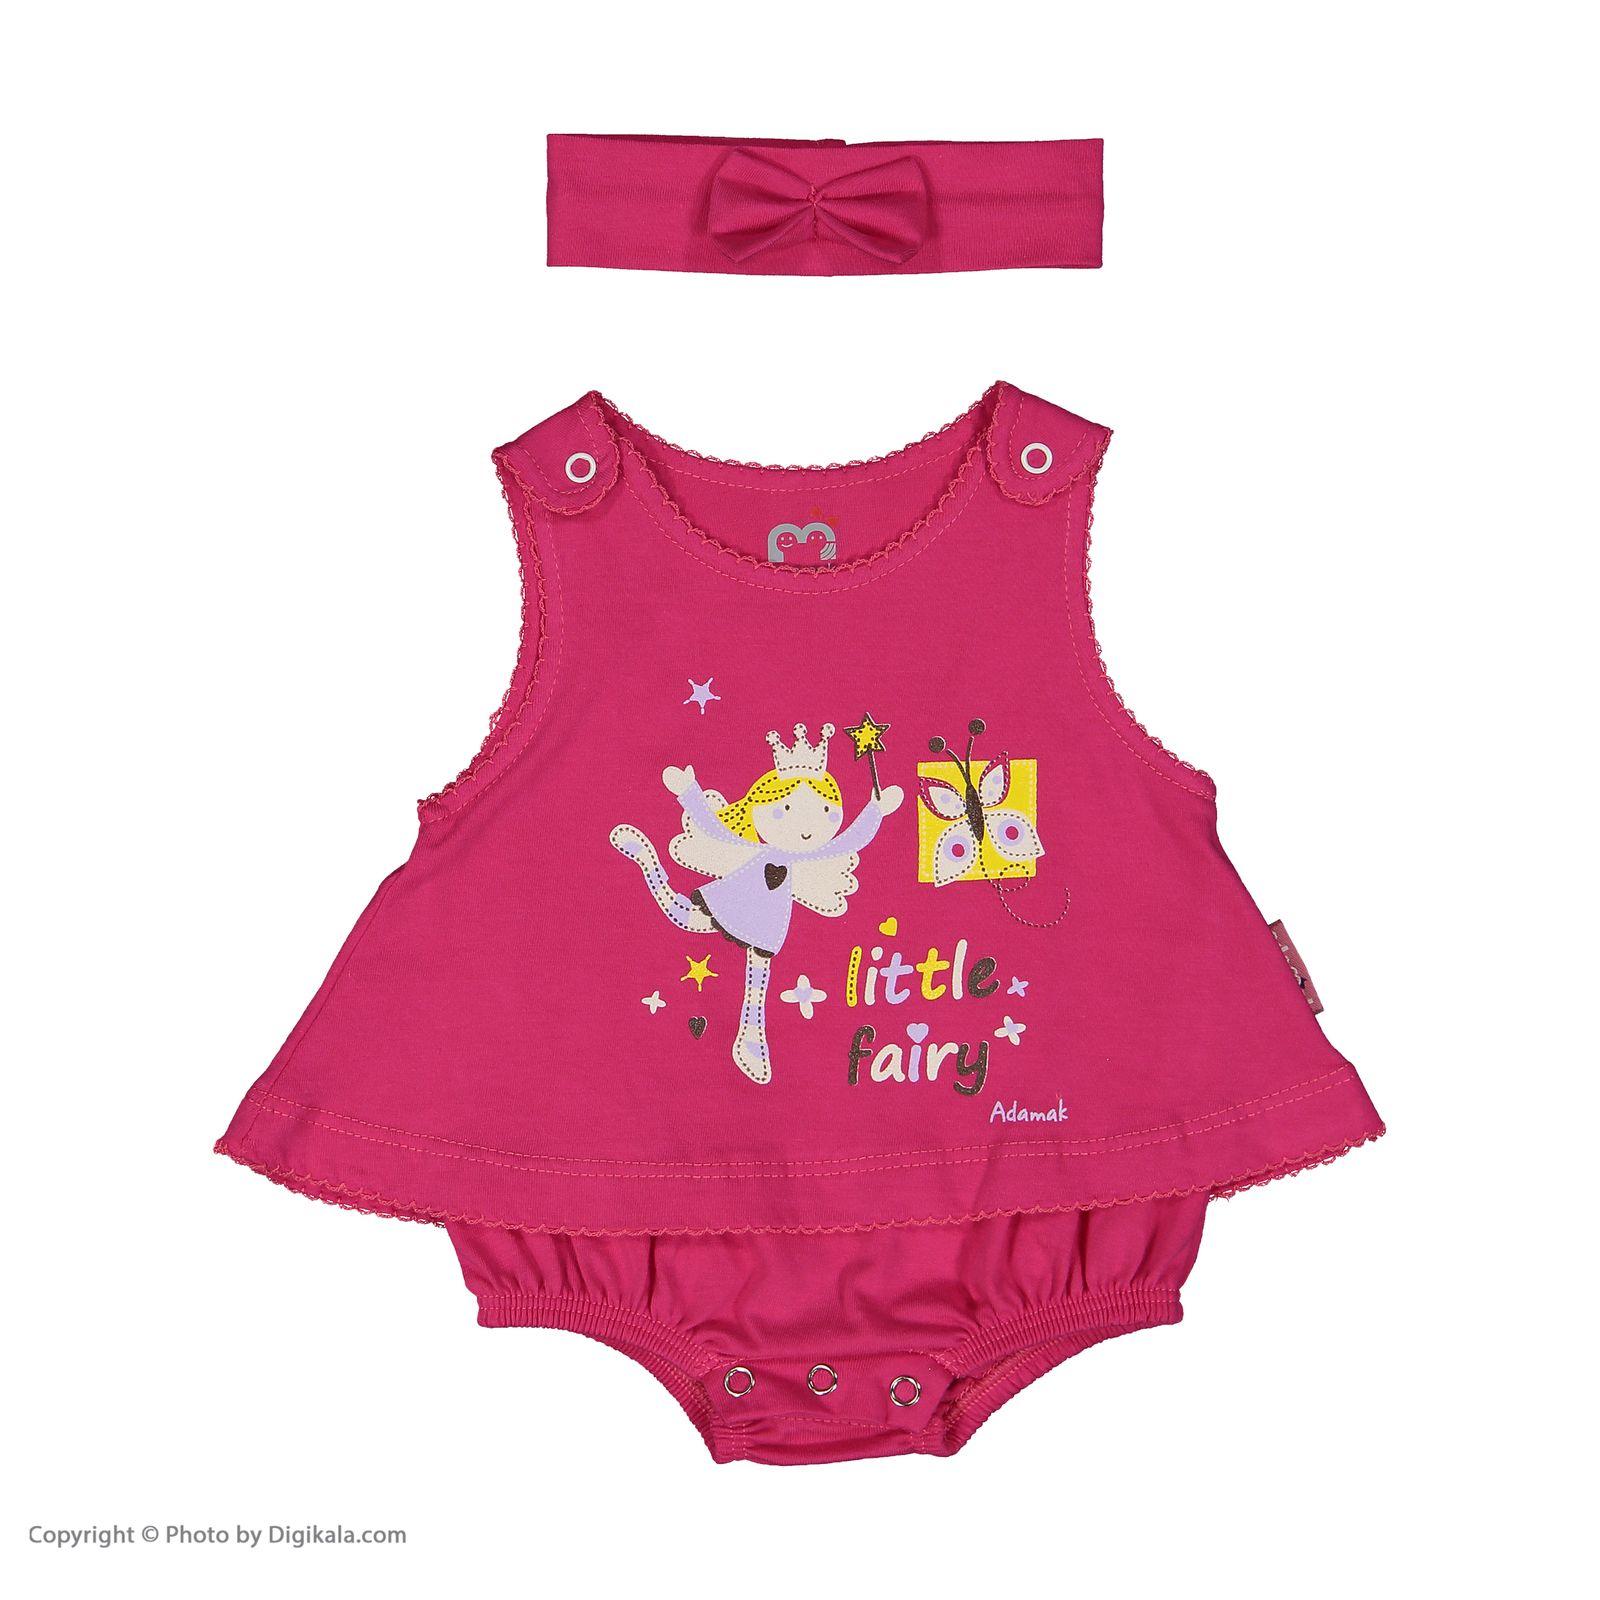 سرهمی نوزادی دخترانه آدمک مدل 2171108-88 -  - 3